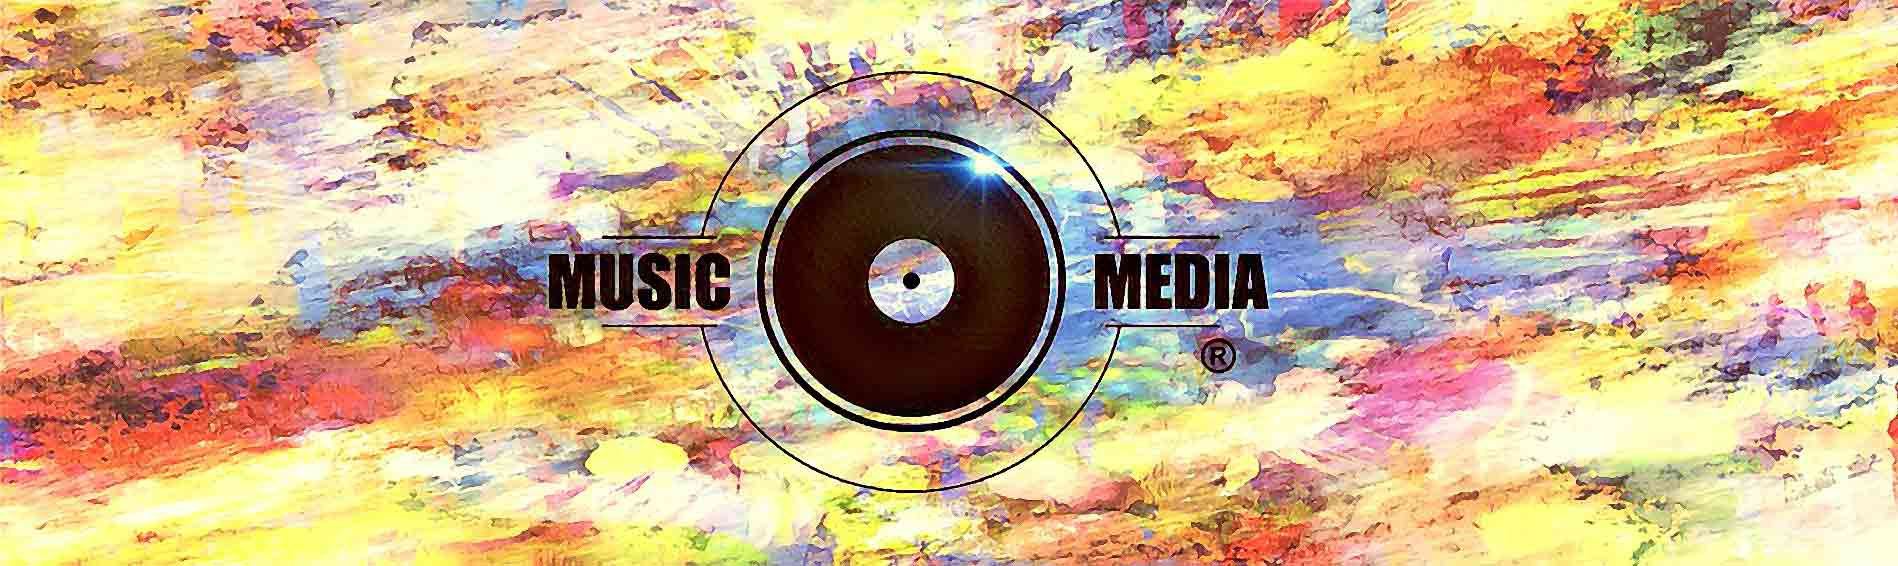 Music-Media-Madrid-productora-y-promotora